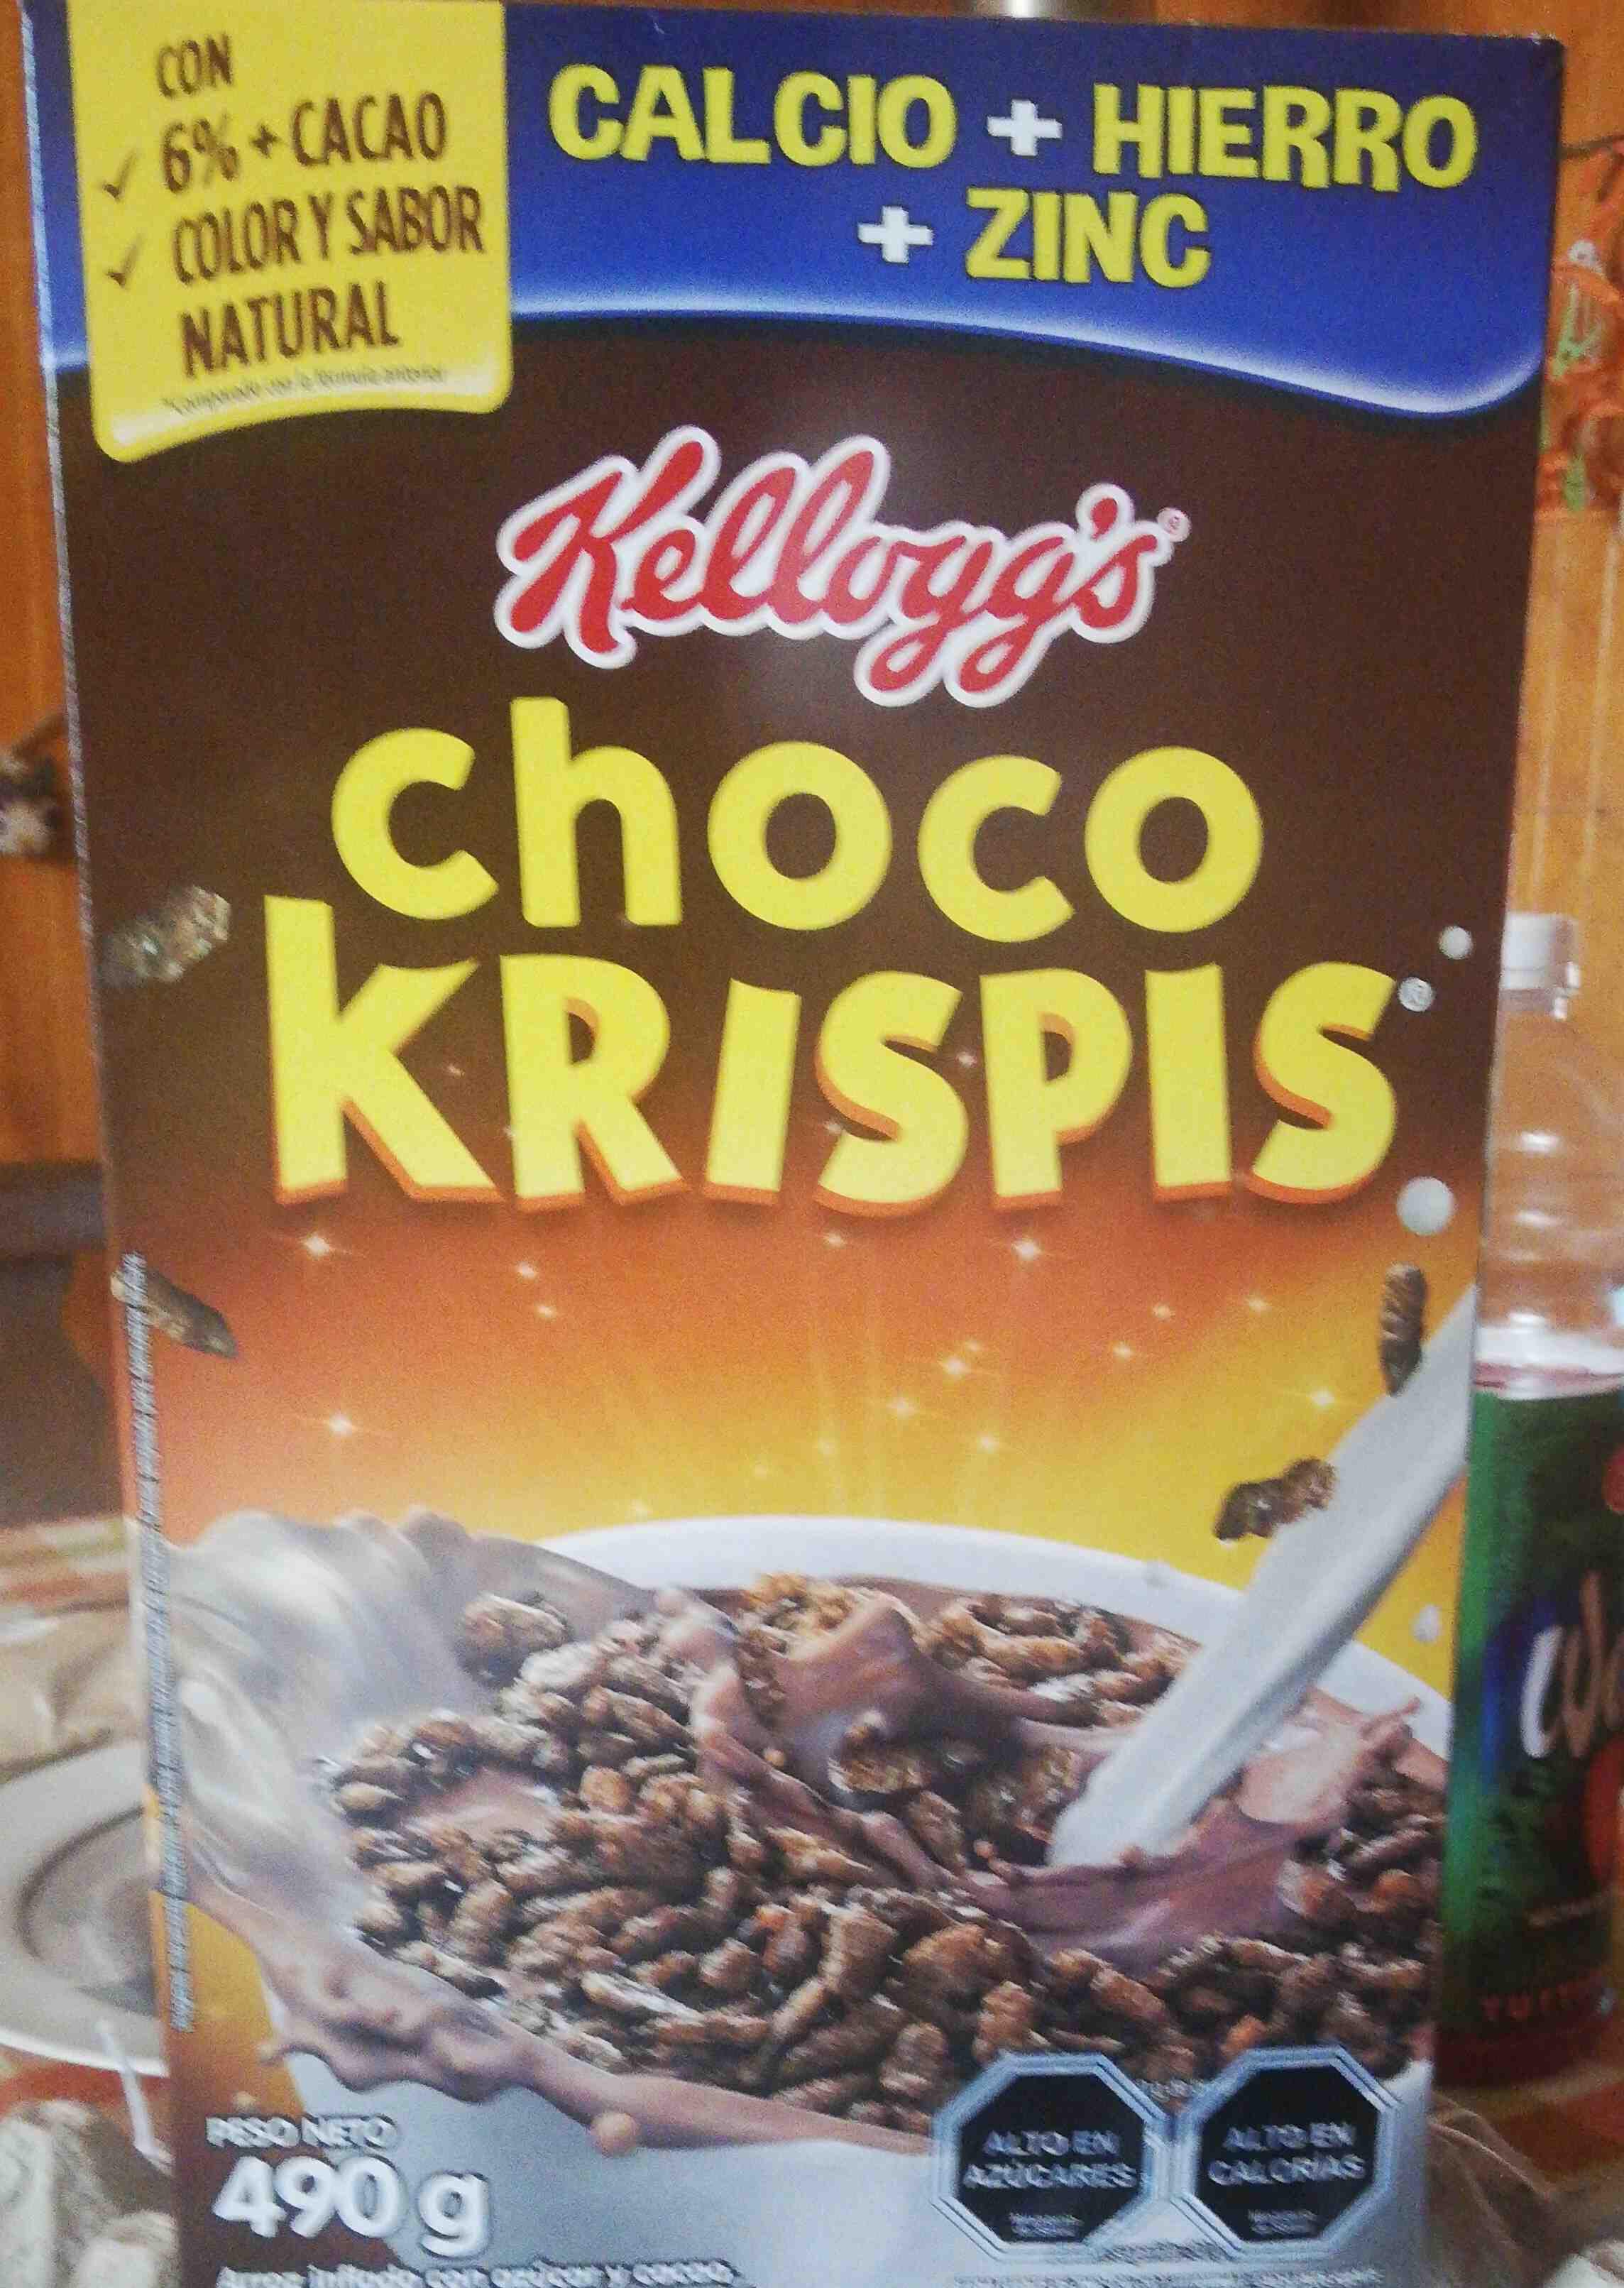 Kellogg's choco krispis - Product - en